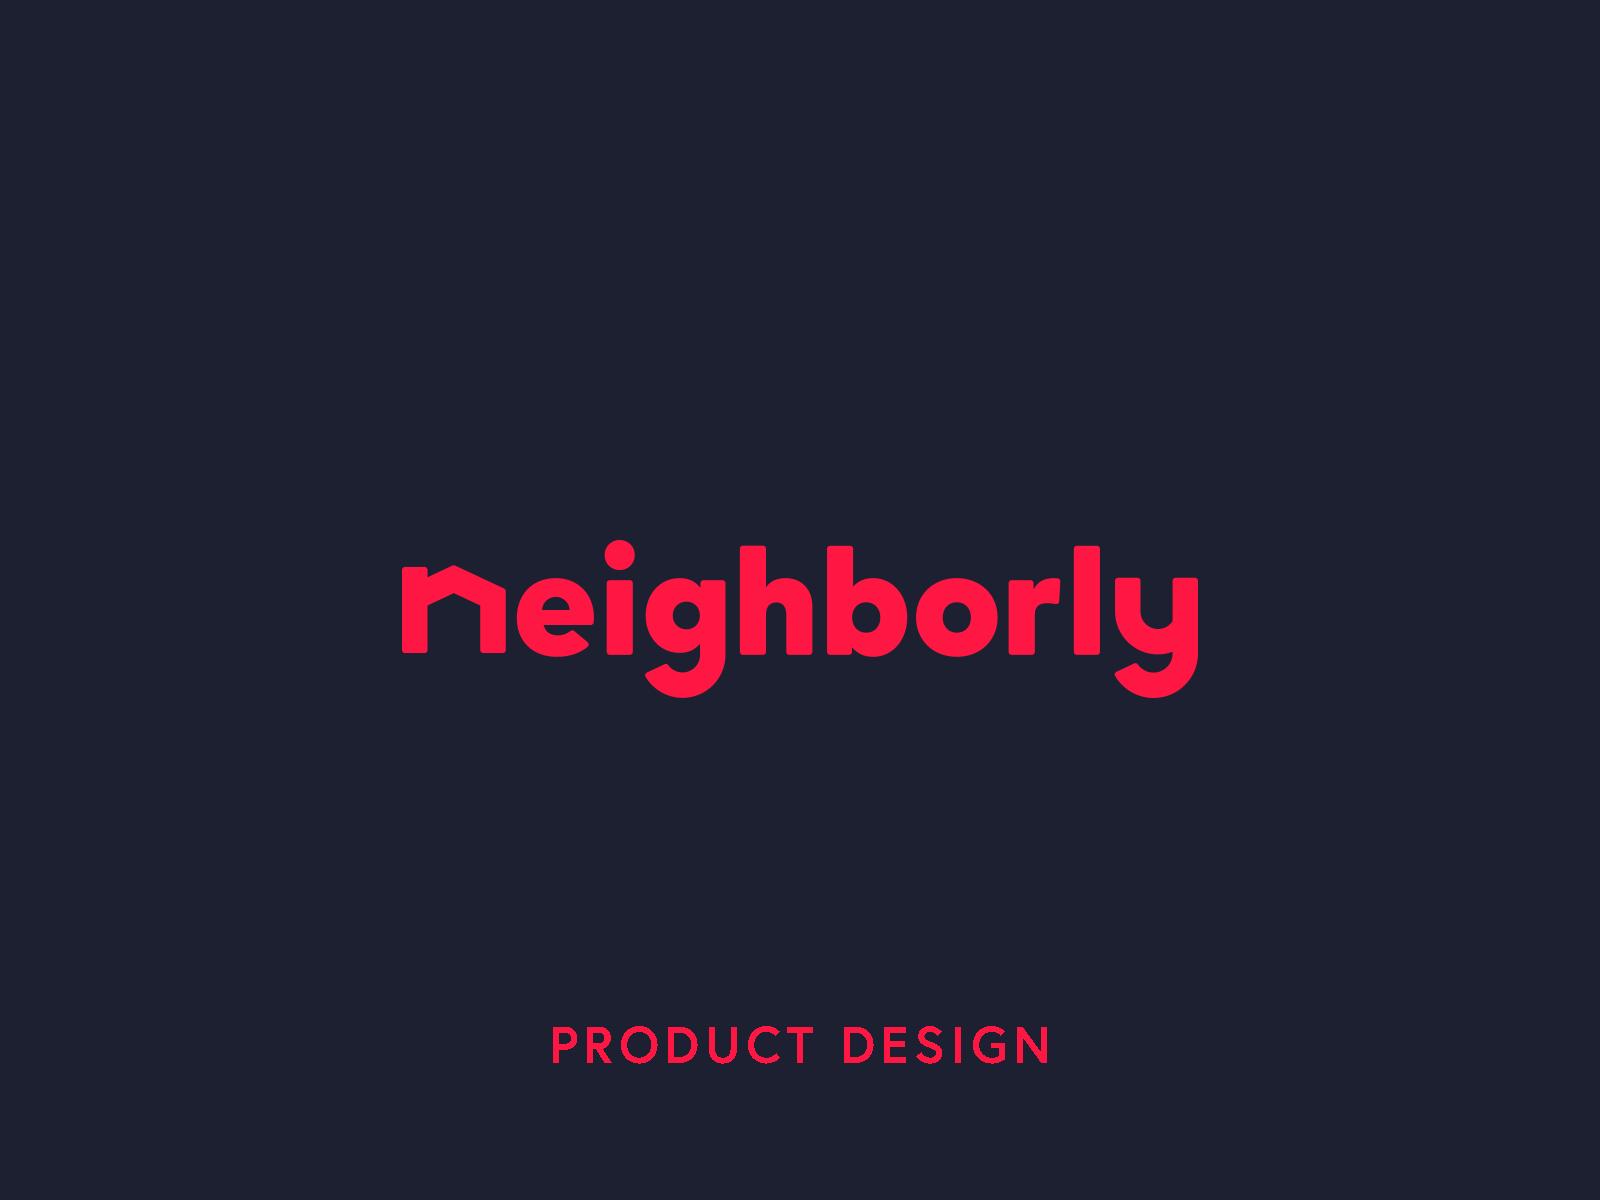 Neighborly.png